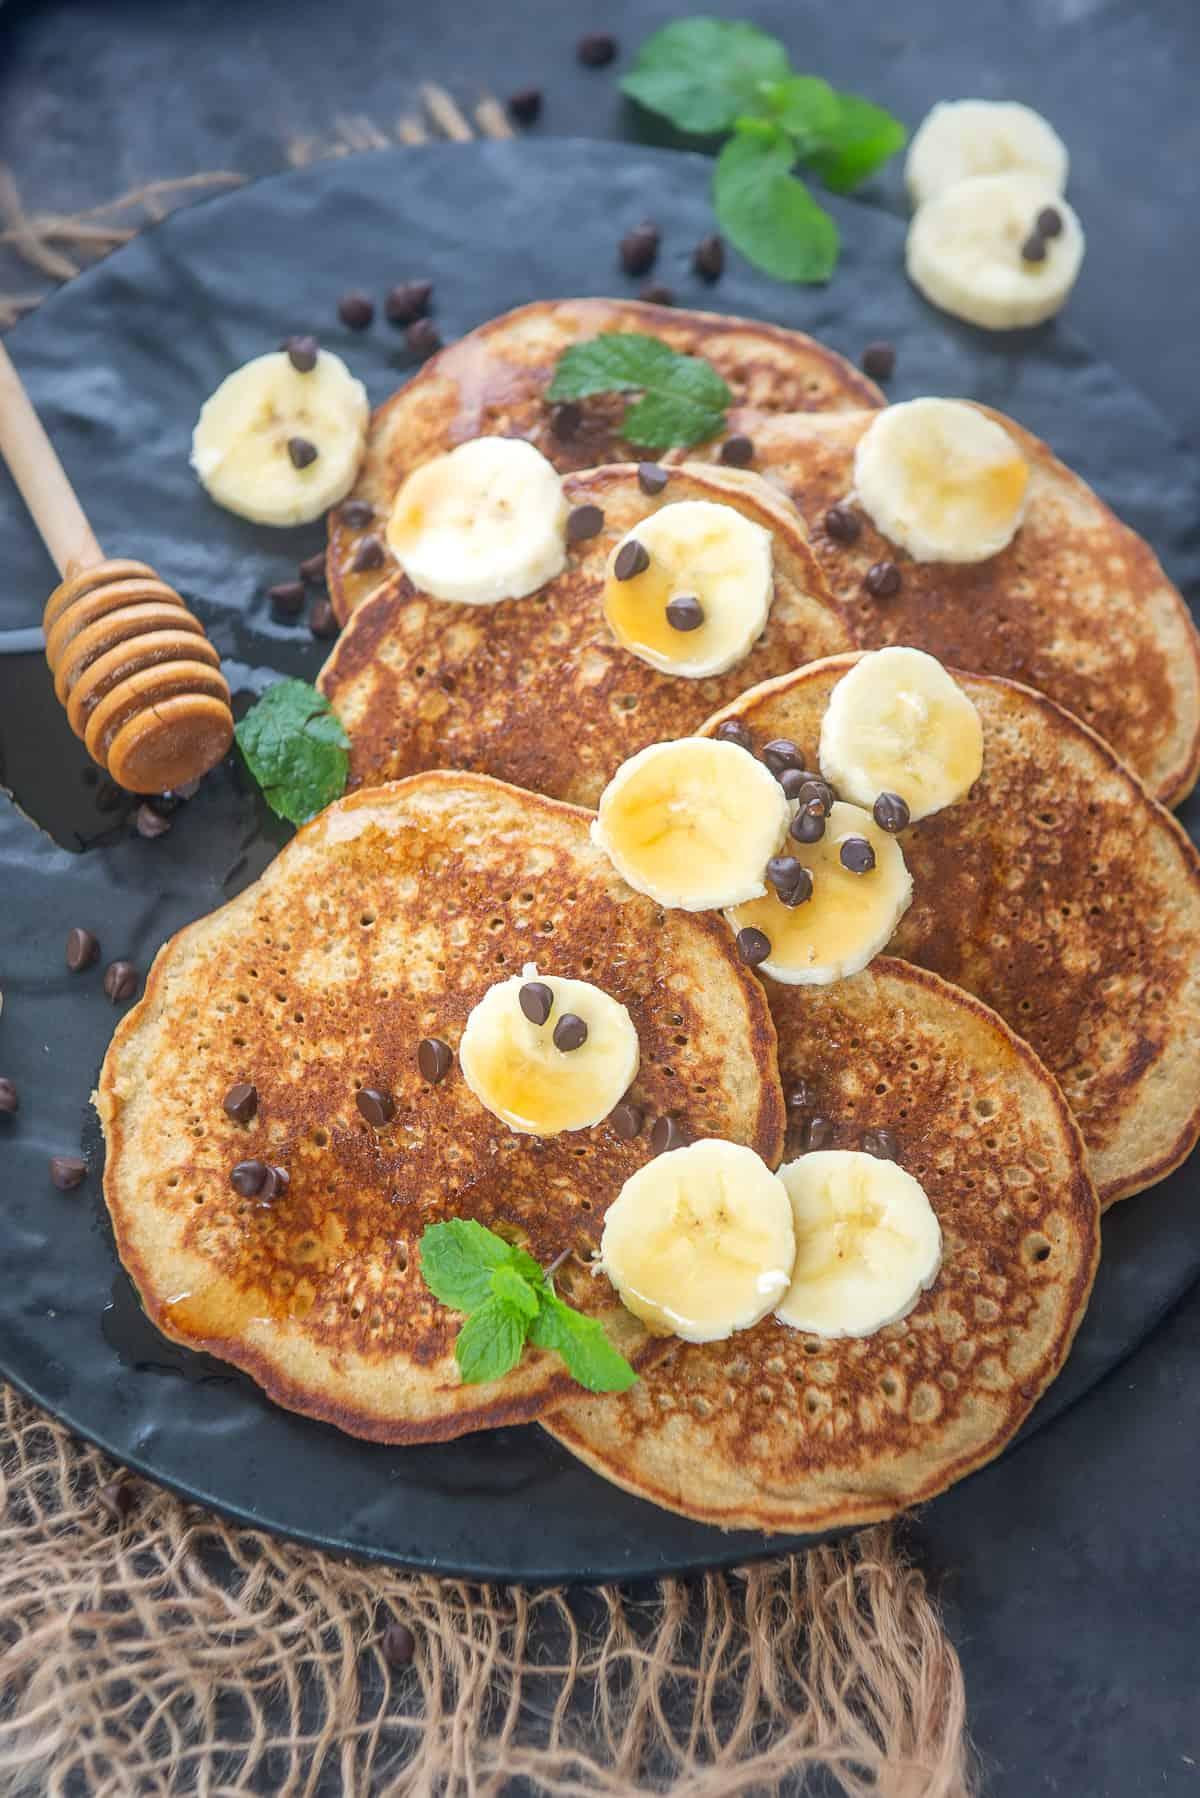 Banana Oatmeal Pancakes served on a plate.